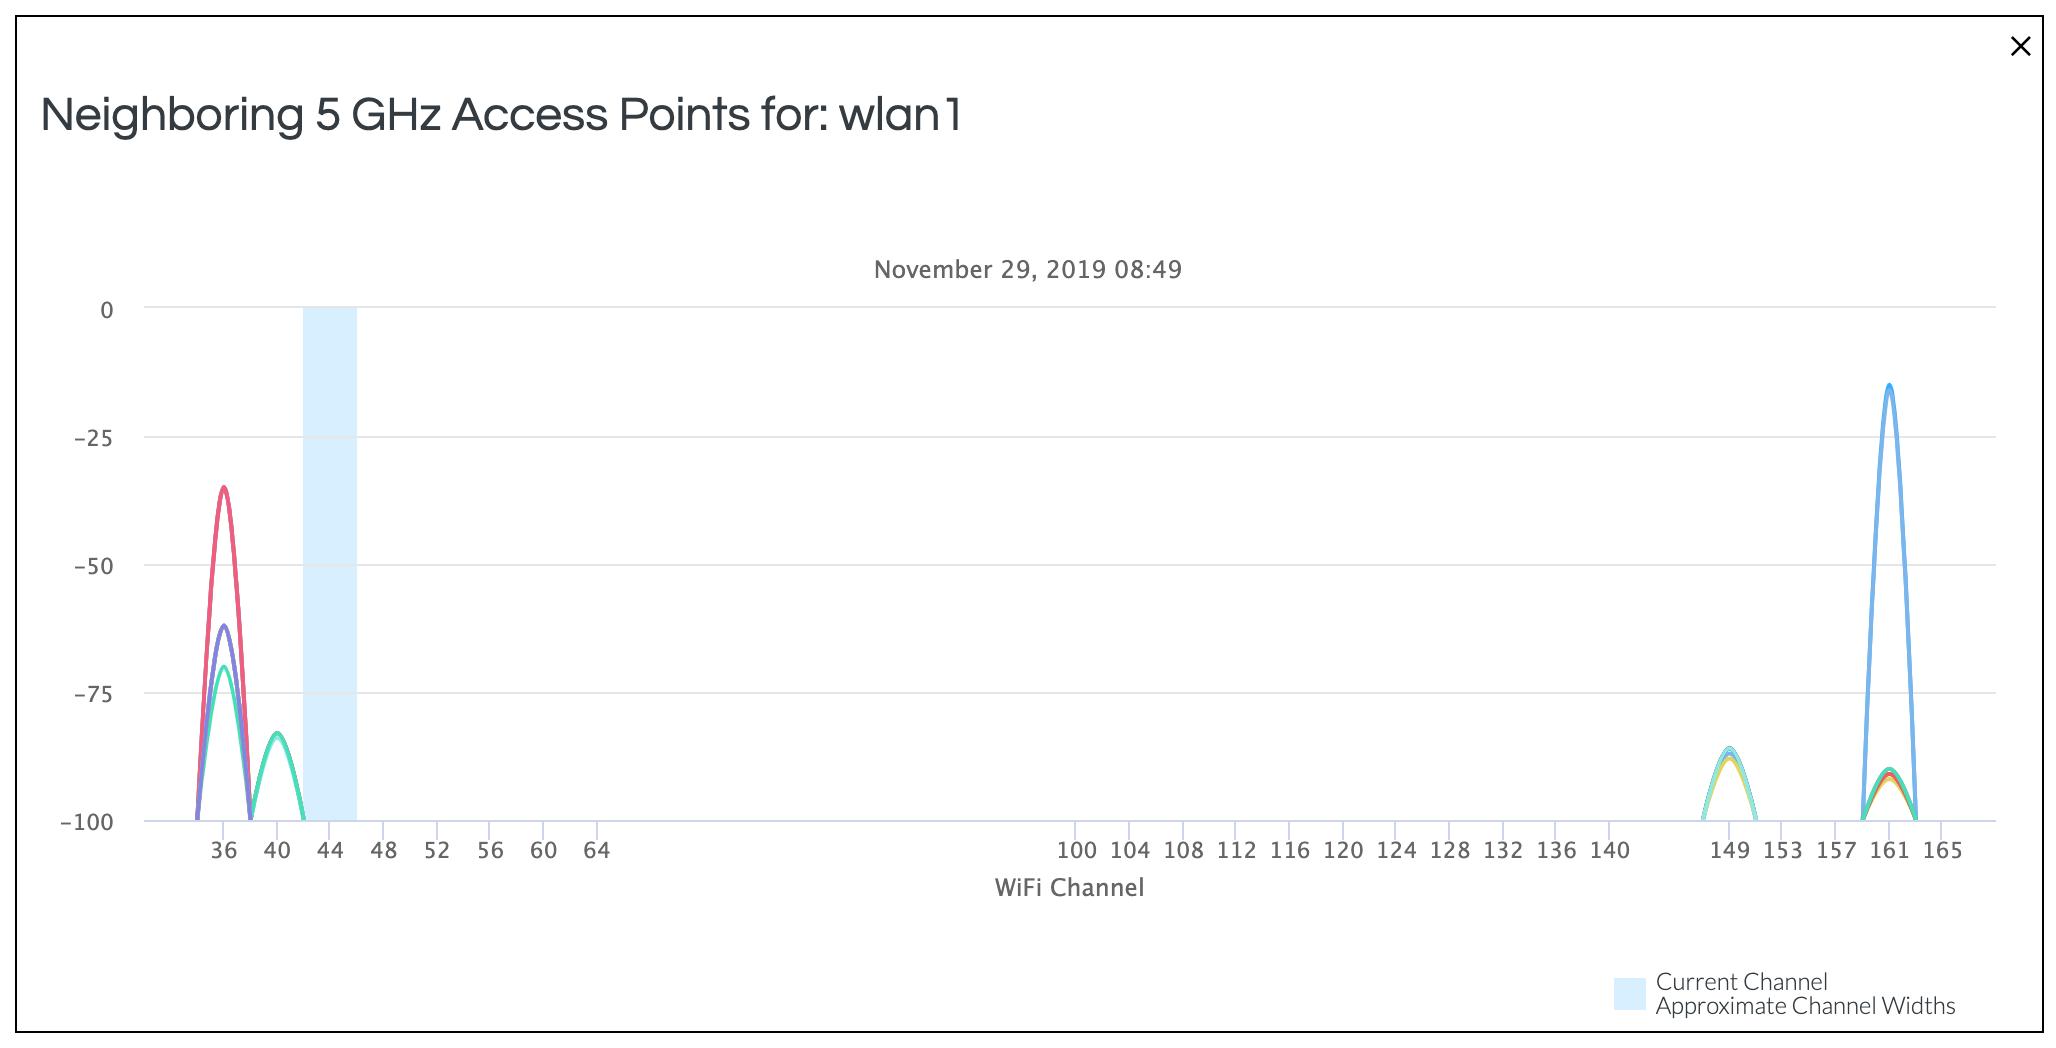 Minim Neighboring Access Points - 5 GHz